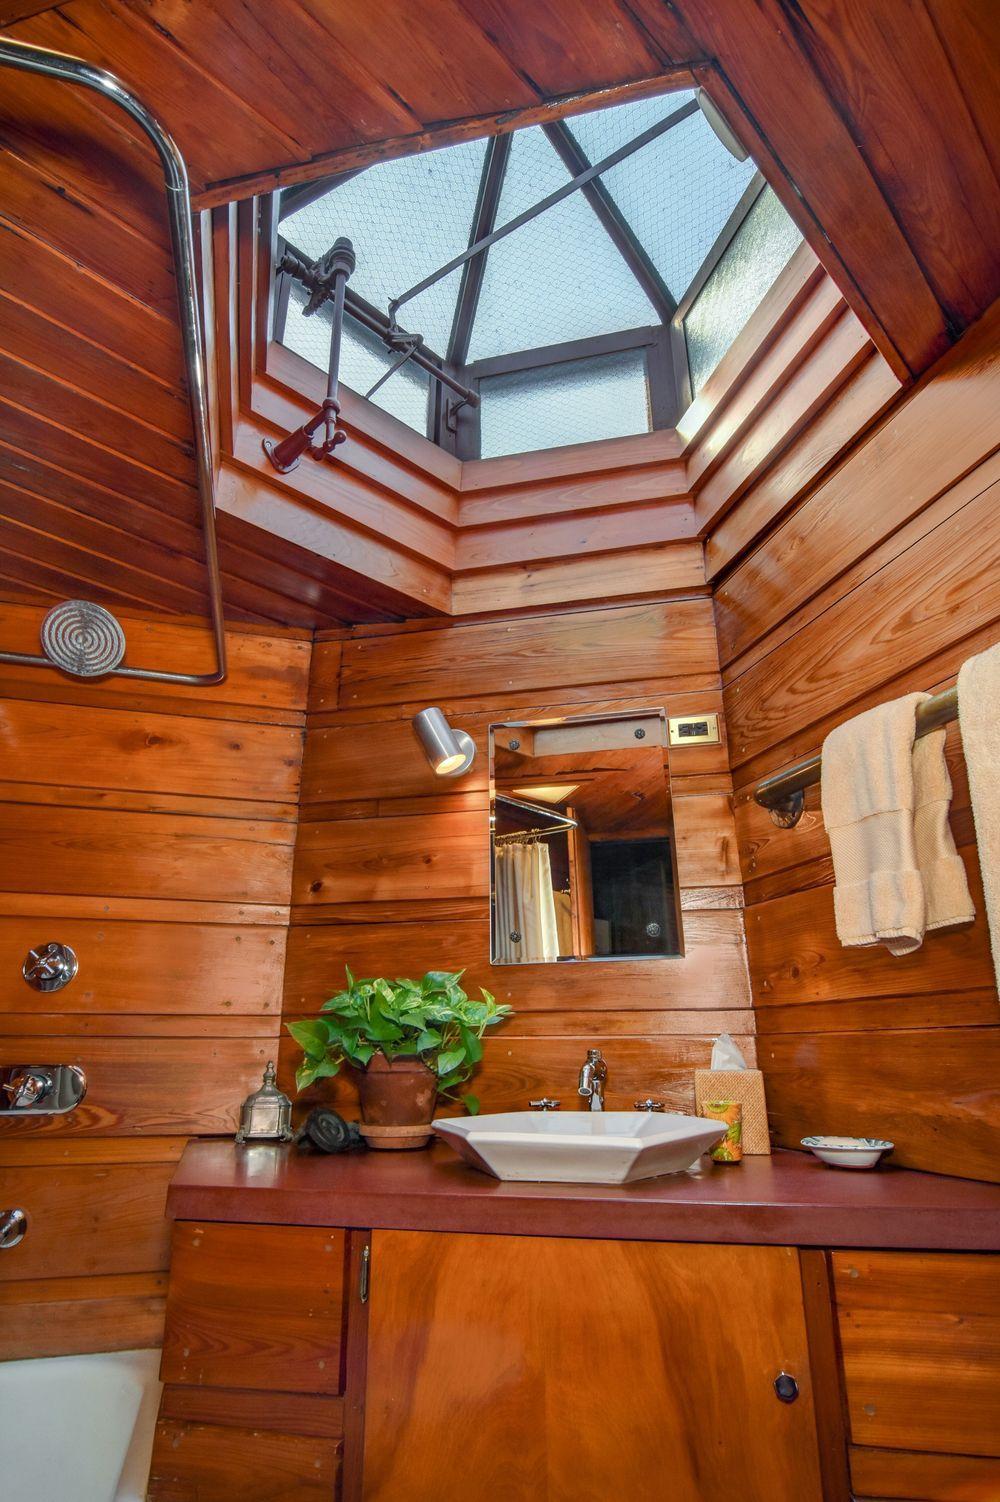 frank lloyd wright hexagonal home up for sale in new jersey frank rh pinterest com